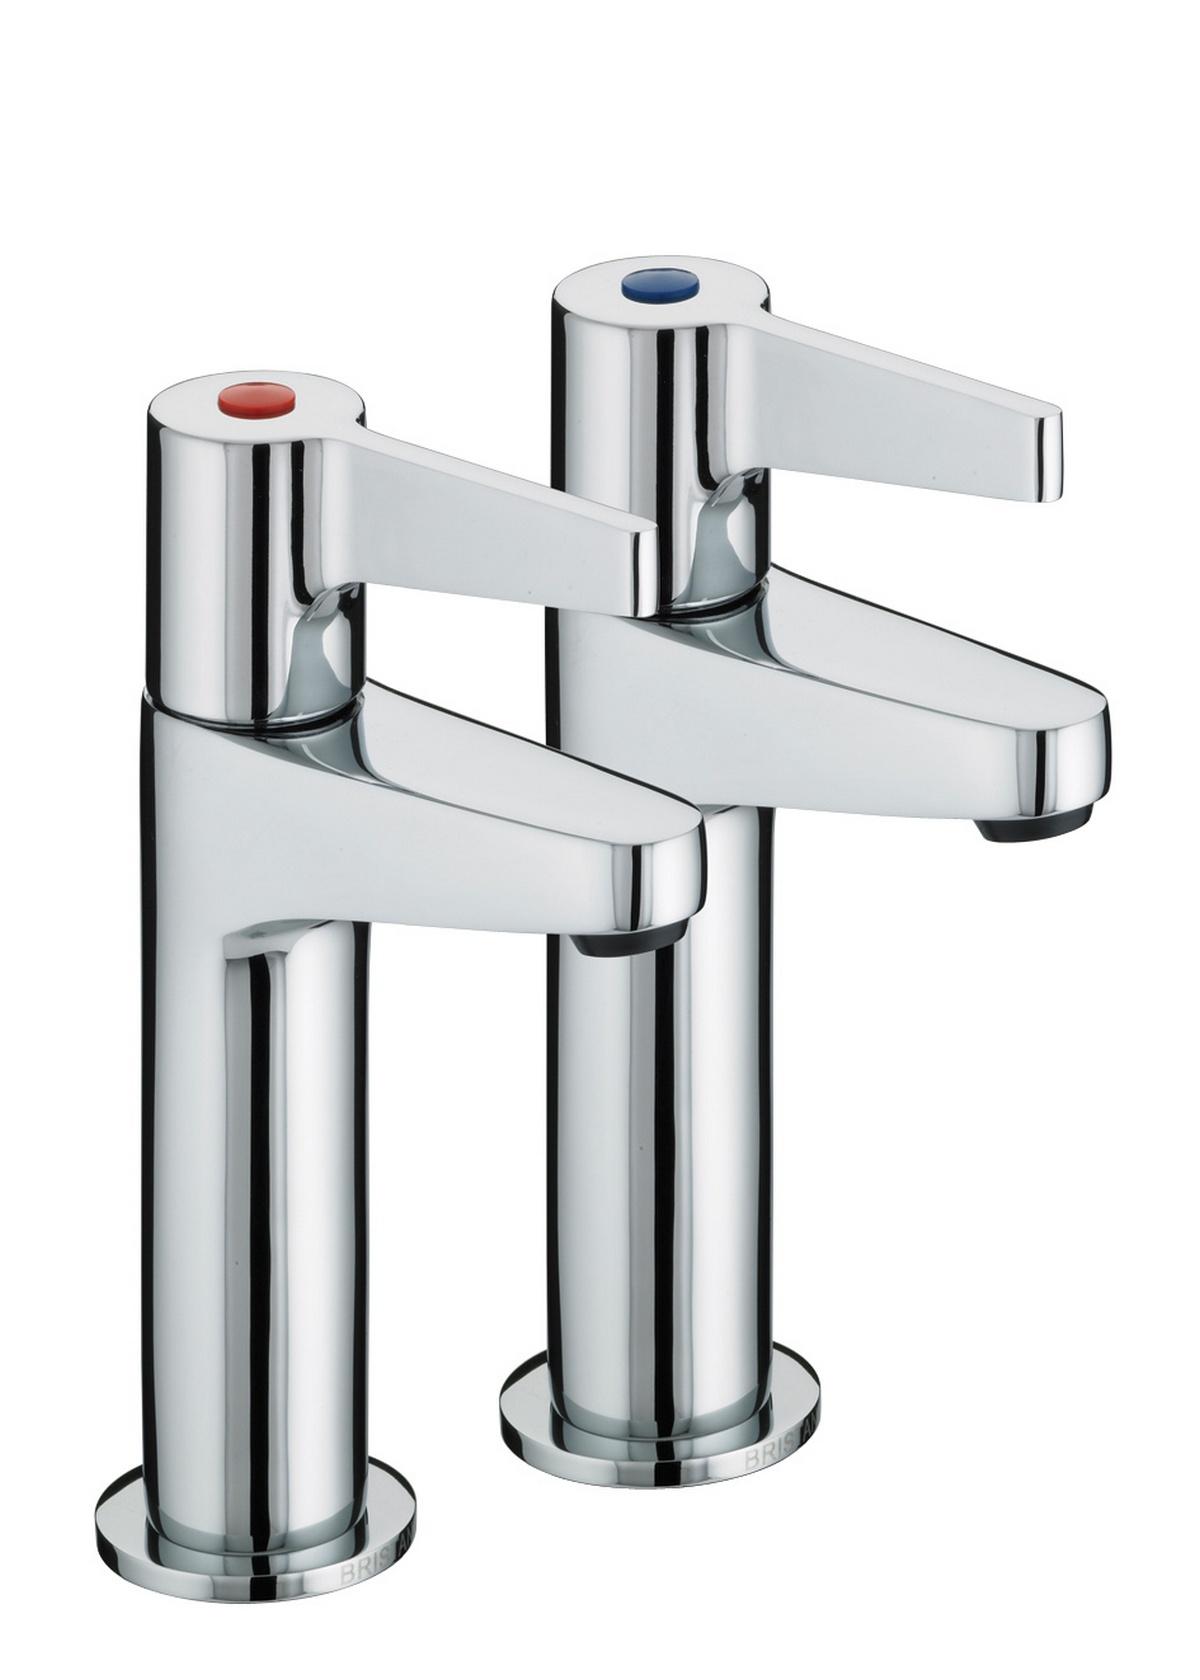 Bristan | Design Utility Lever | DULHNKC | Kitchen Taps